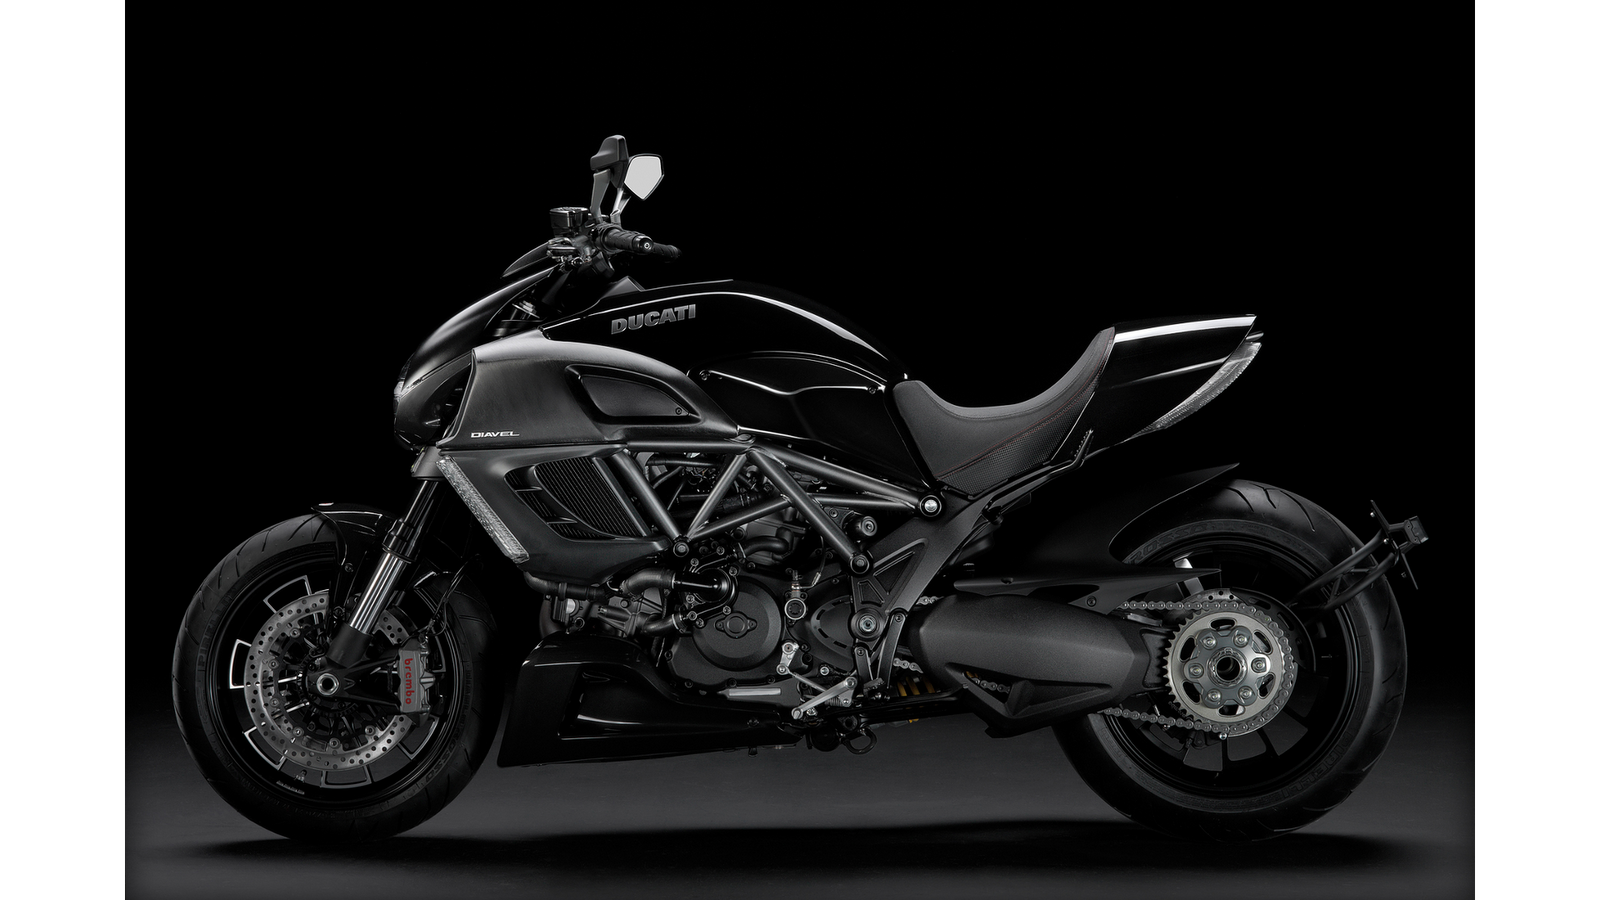 motorcycle motor models 2011 ducati diavel. Black Bedroom Furniture Sets. Home Design Ideas